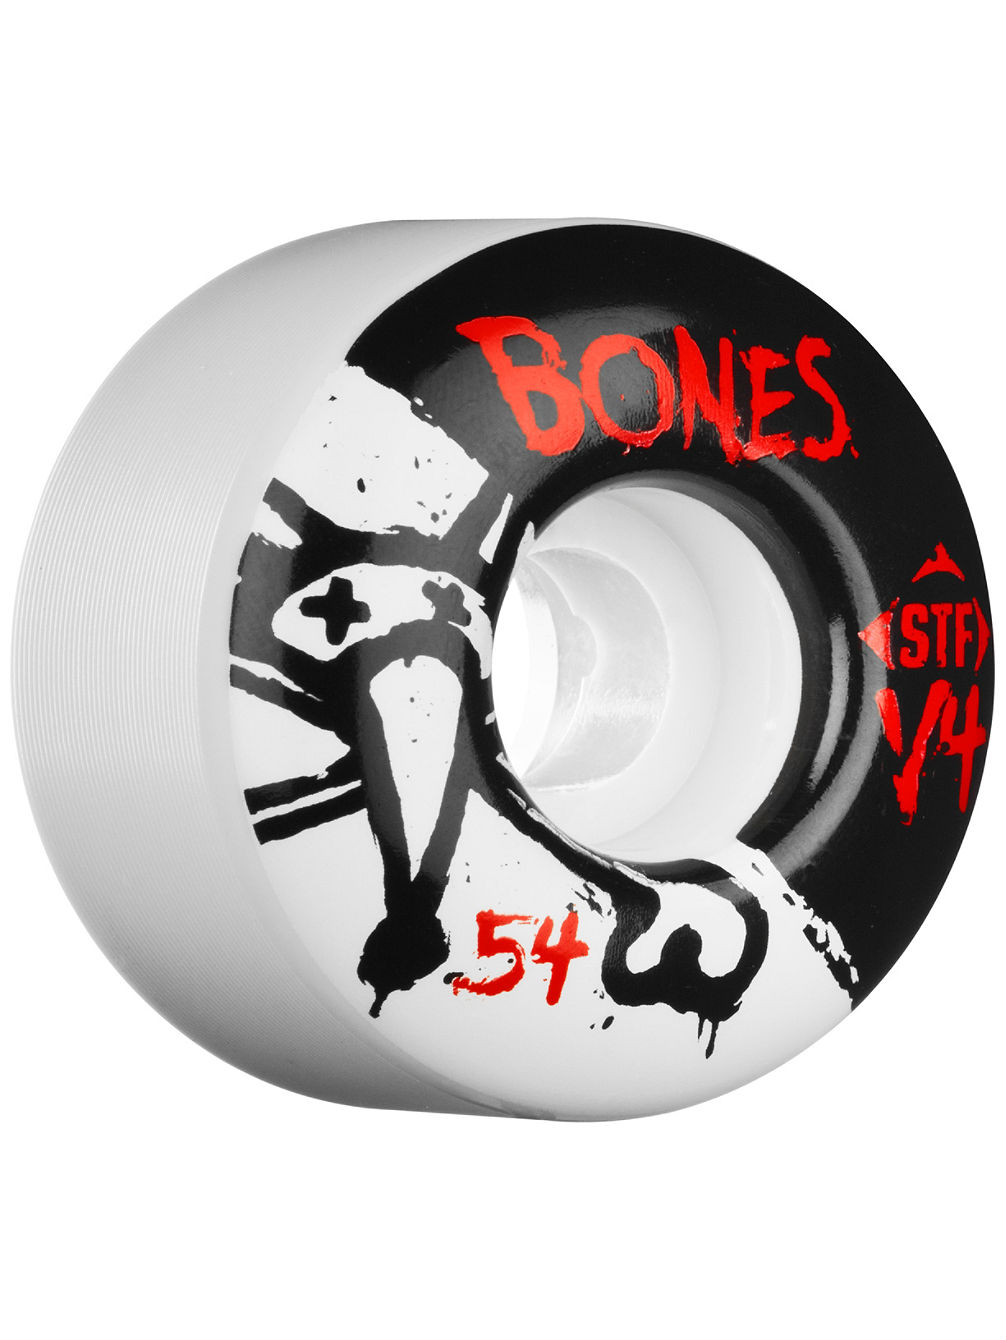 bones-wheels-stf-v4-series-ii-83b-51mm-wheels